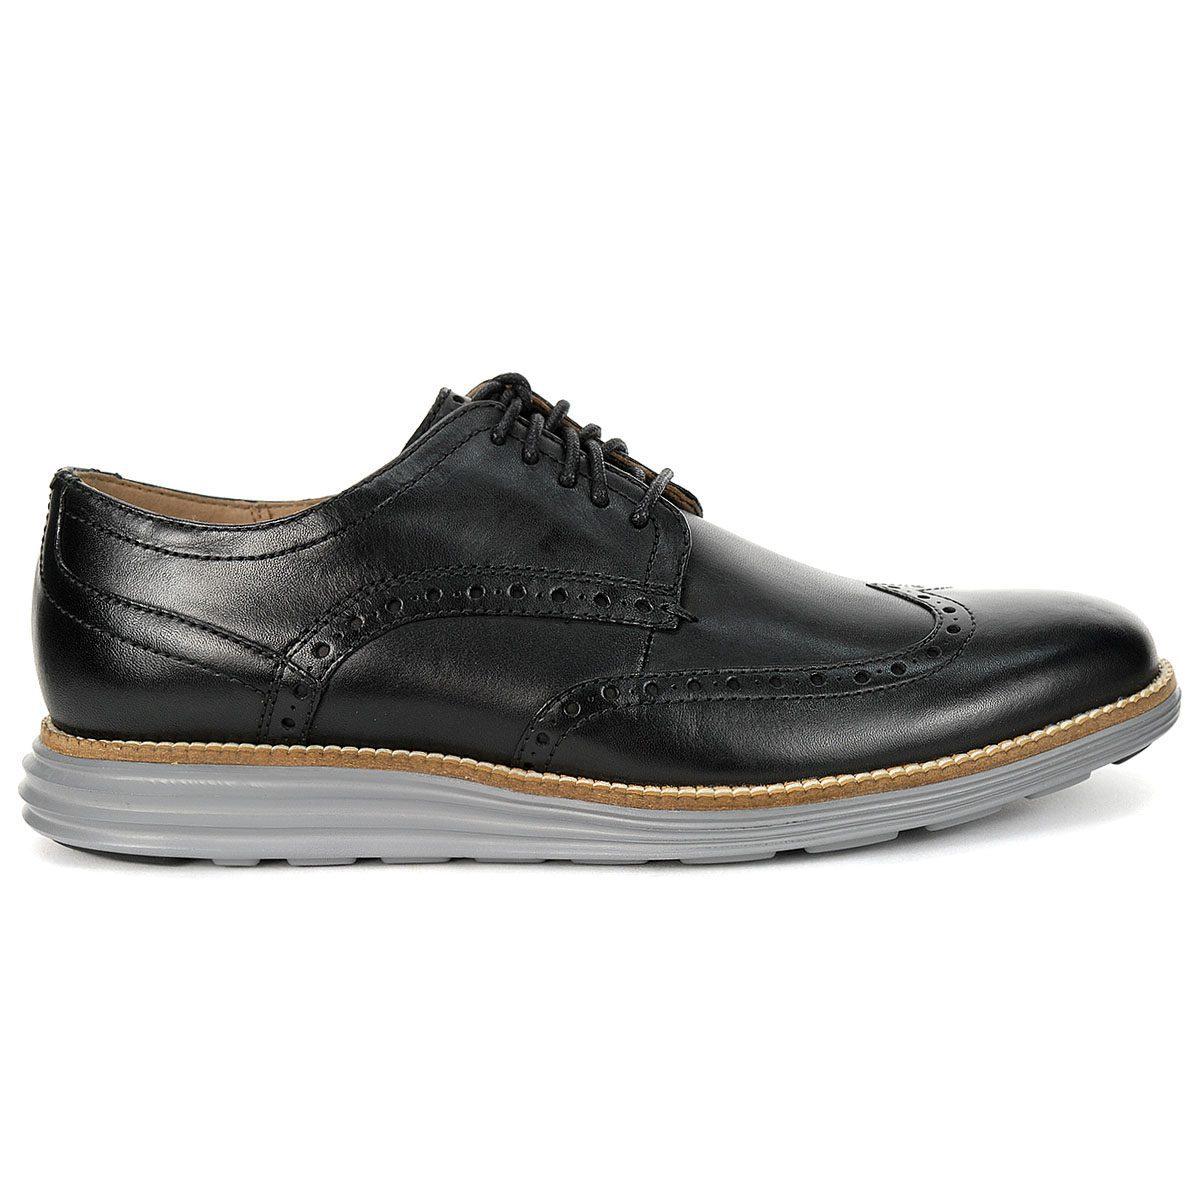 Cole Haan Mens Originalgrand Ultra Black Oxford Dress Shoe Size 11